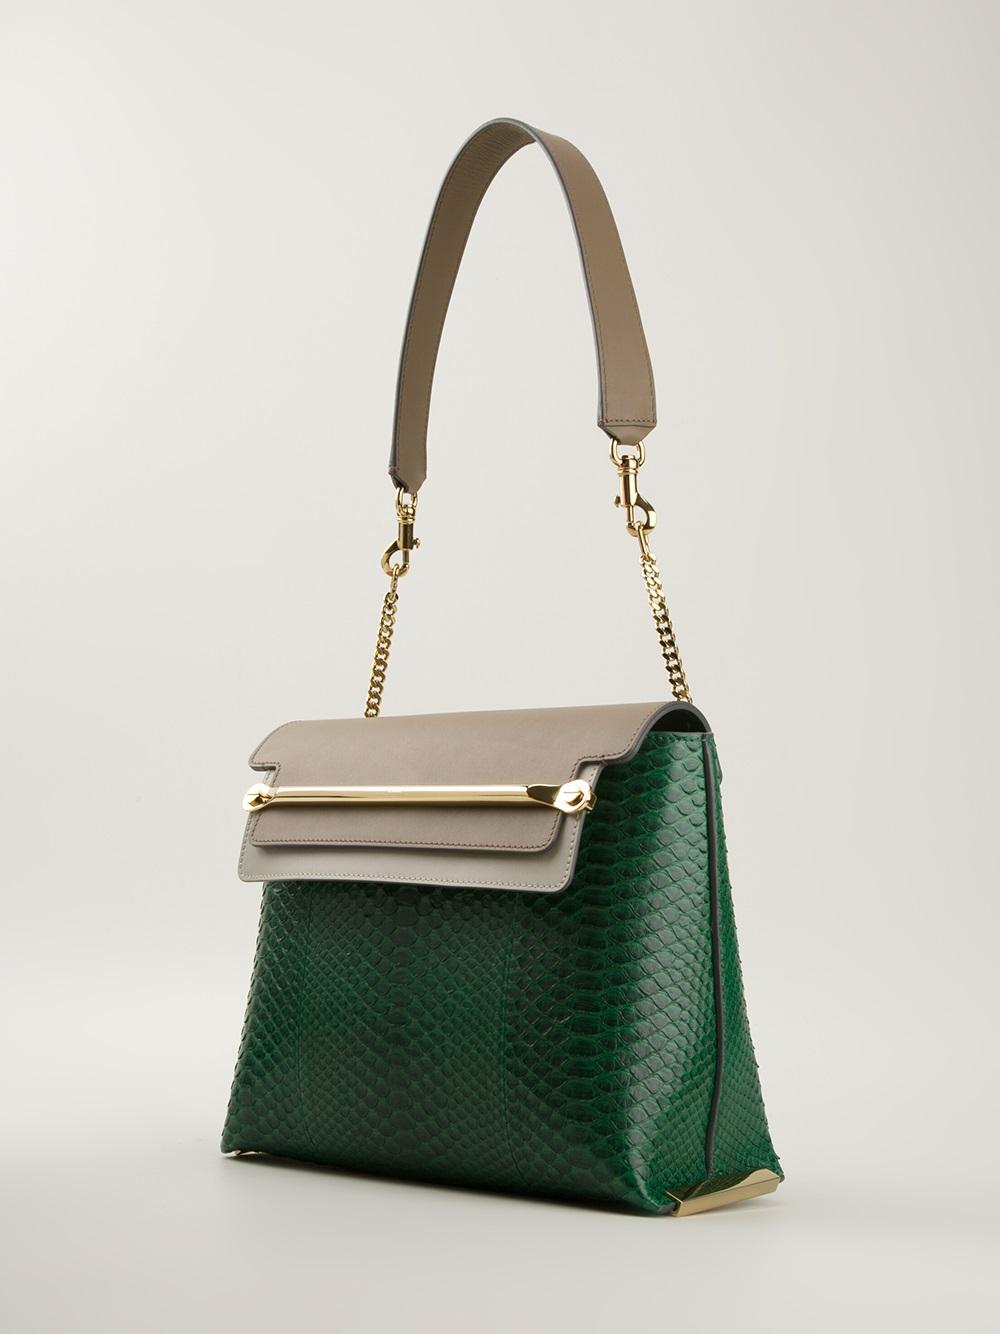 fake chloe handbags - chloe medium clare bag, chloe online